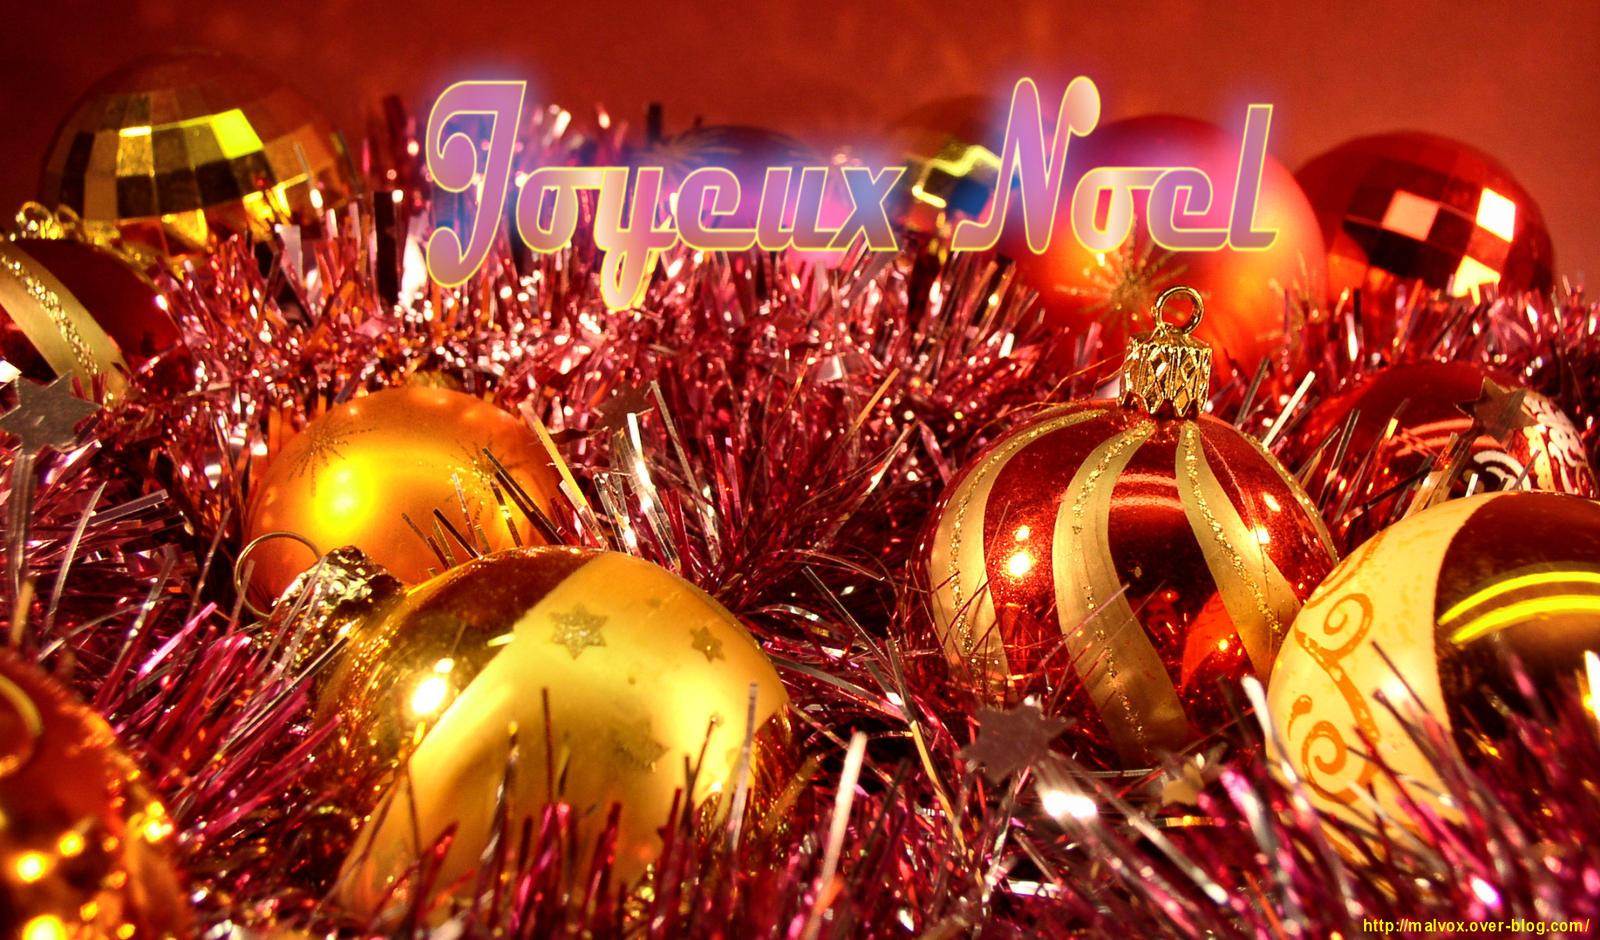 Joyeux noel girlandes boules by malvox on deviantart - Guirlande joyeux noel ...